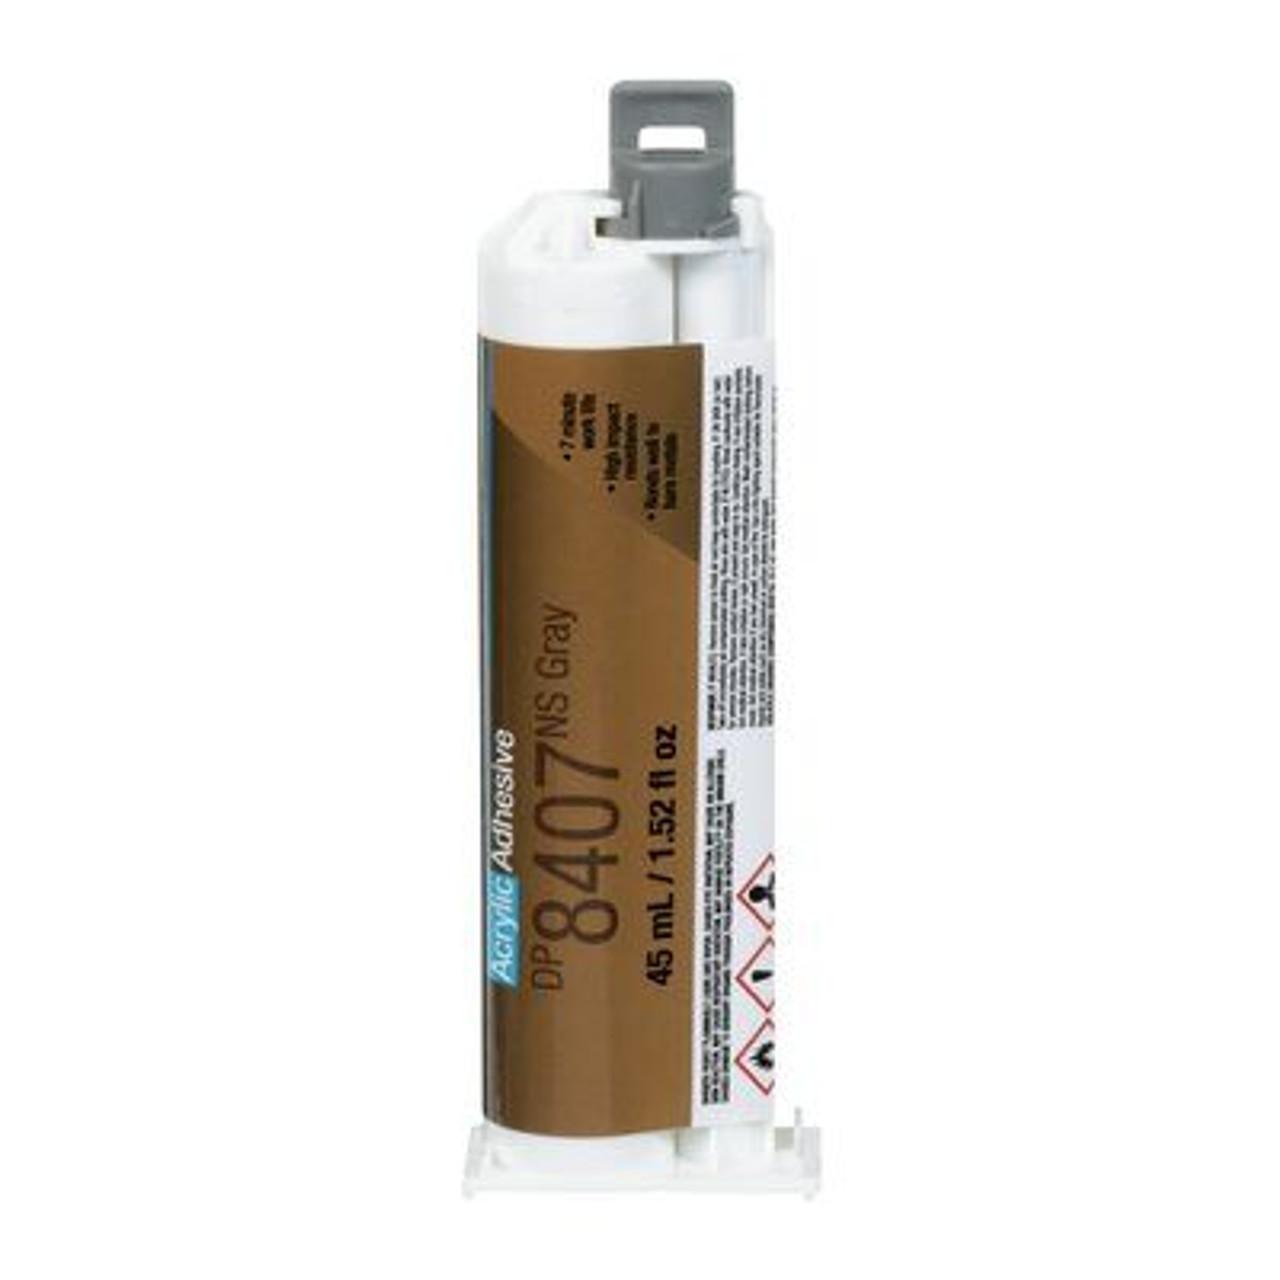 3M™ Scotch-Weld™ Metal Bonder Acrylic Adhesive DP8407NS, Gray, 45 mL Duo-Pak, 12/case